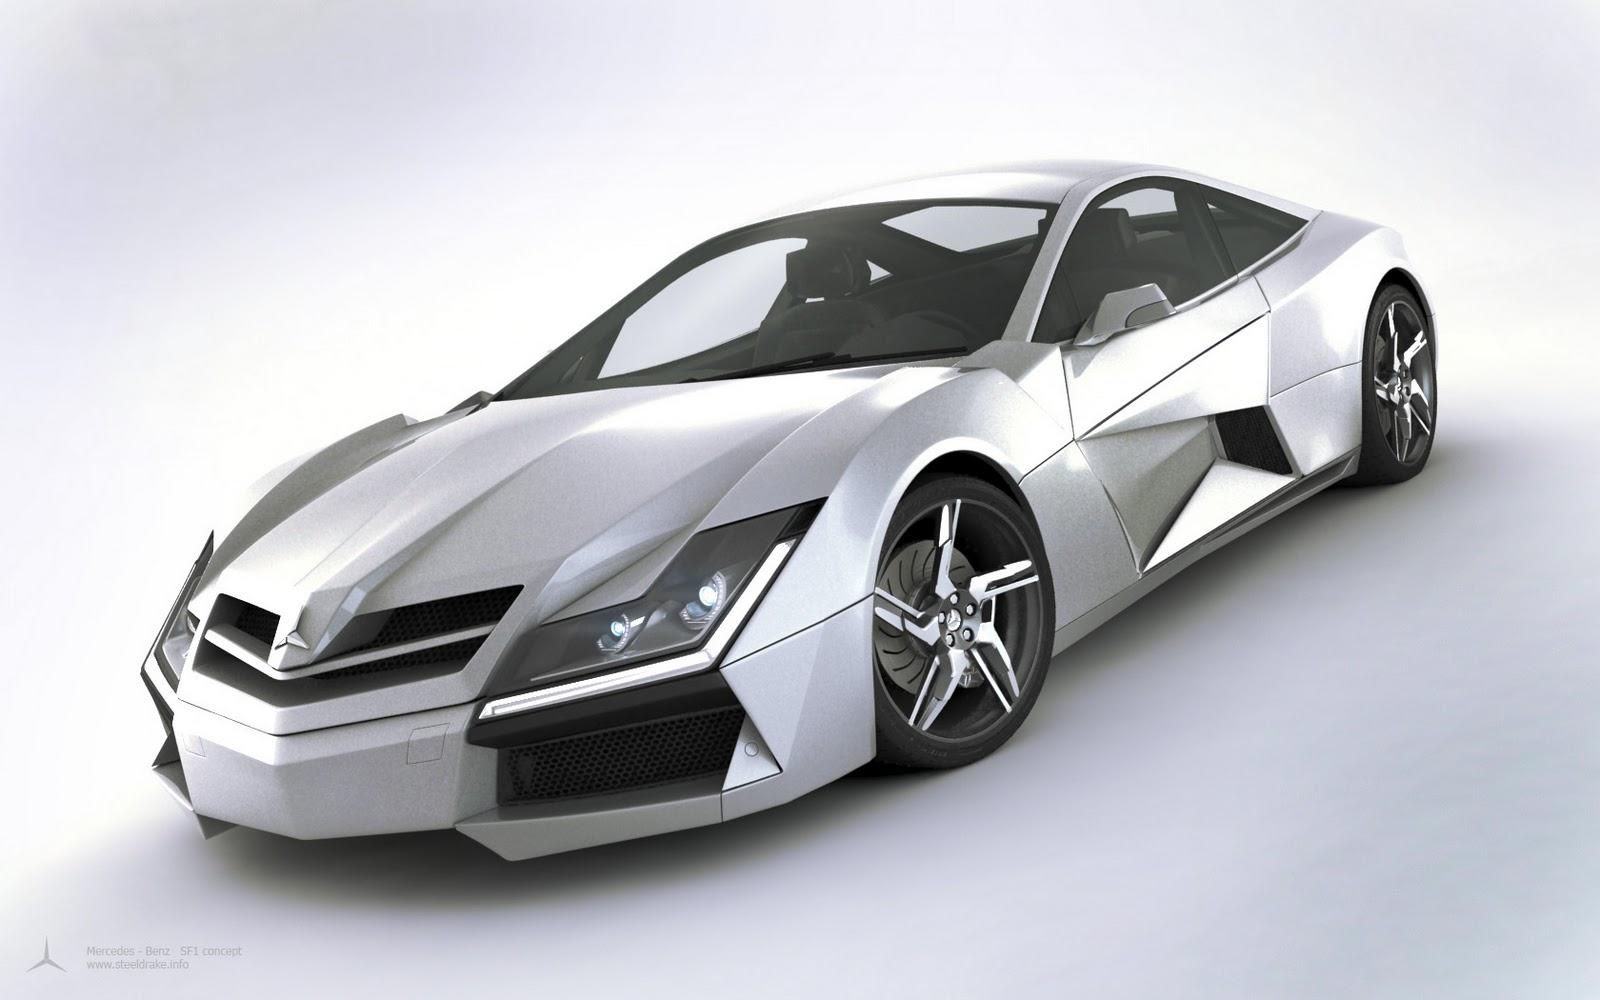 Super Punch Mercedesbenz Sf1 Concept Car